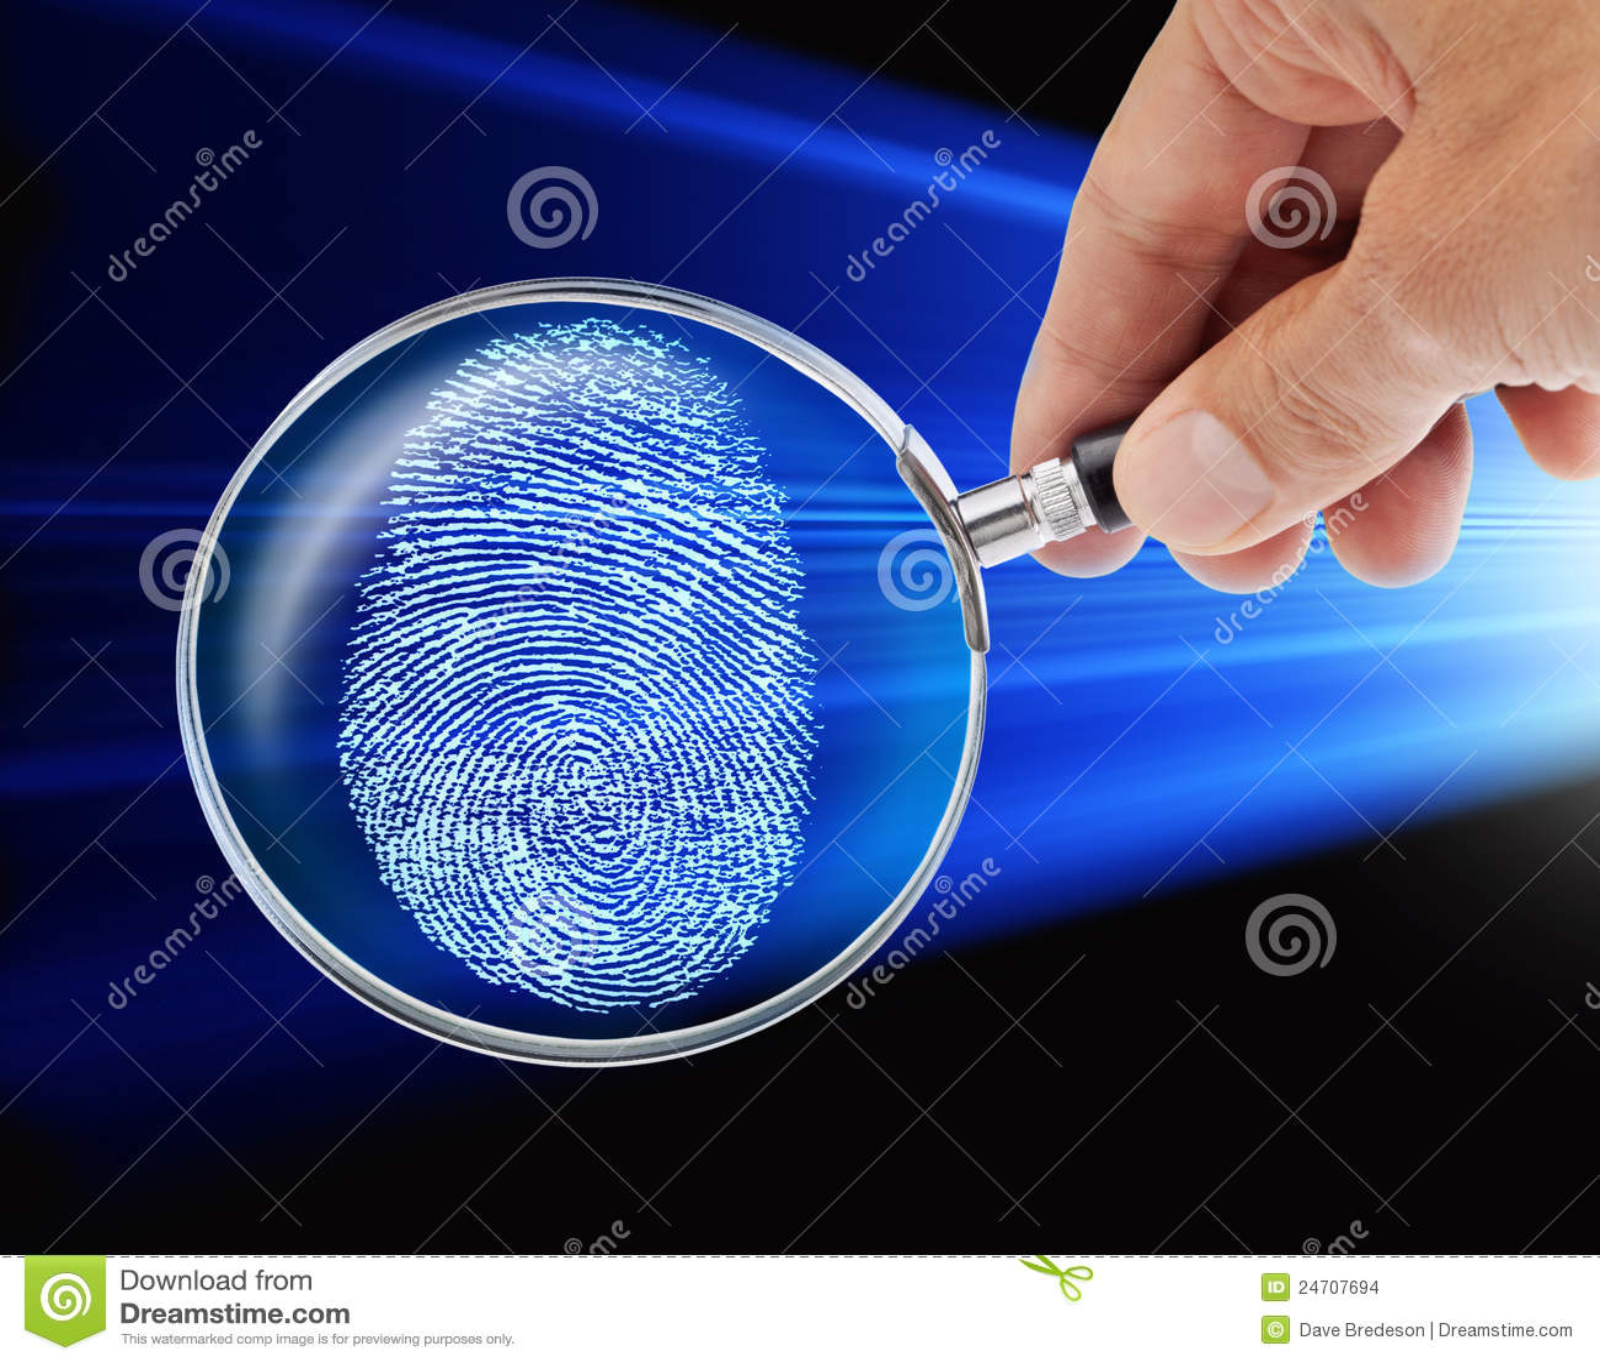 Fingerprint Hand Magnifying Glass Security Hacker